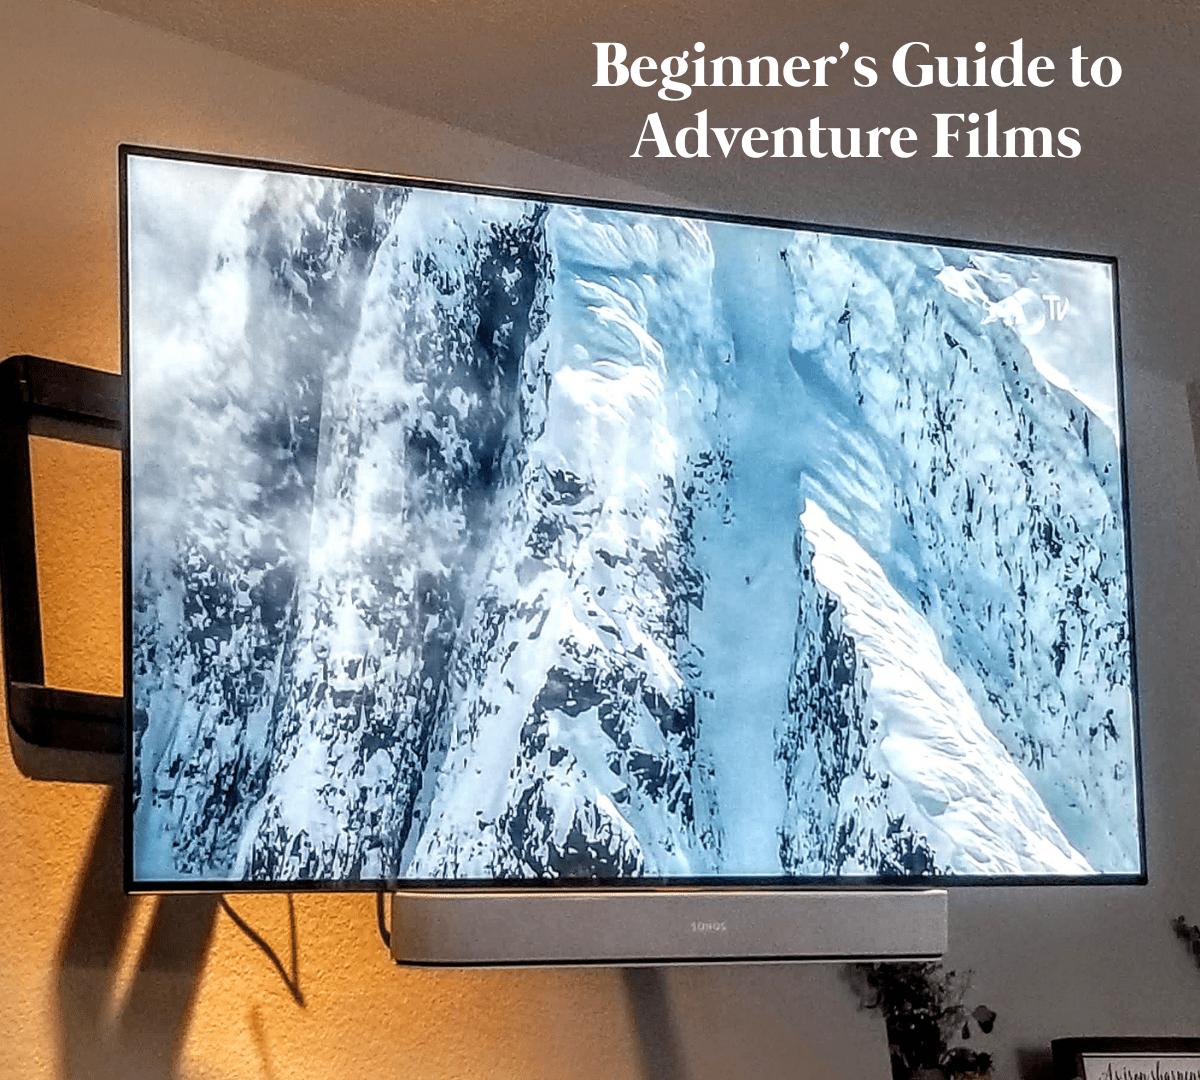 Beginner's Guide to Adventure Films